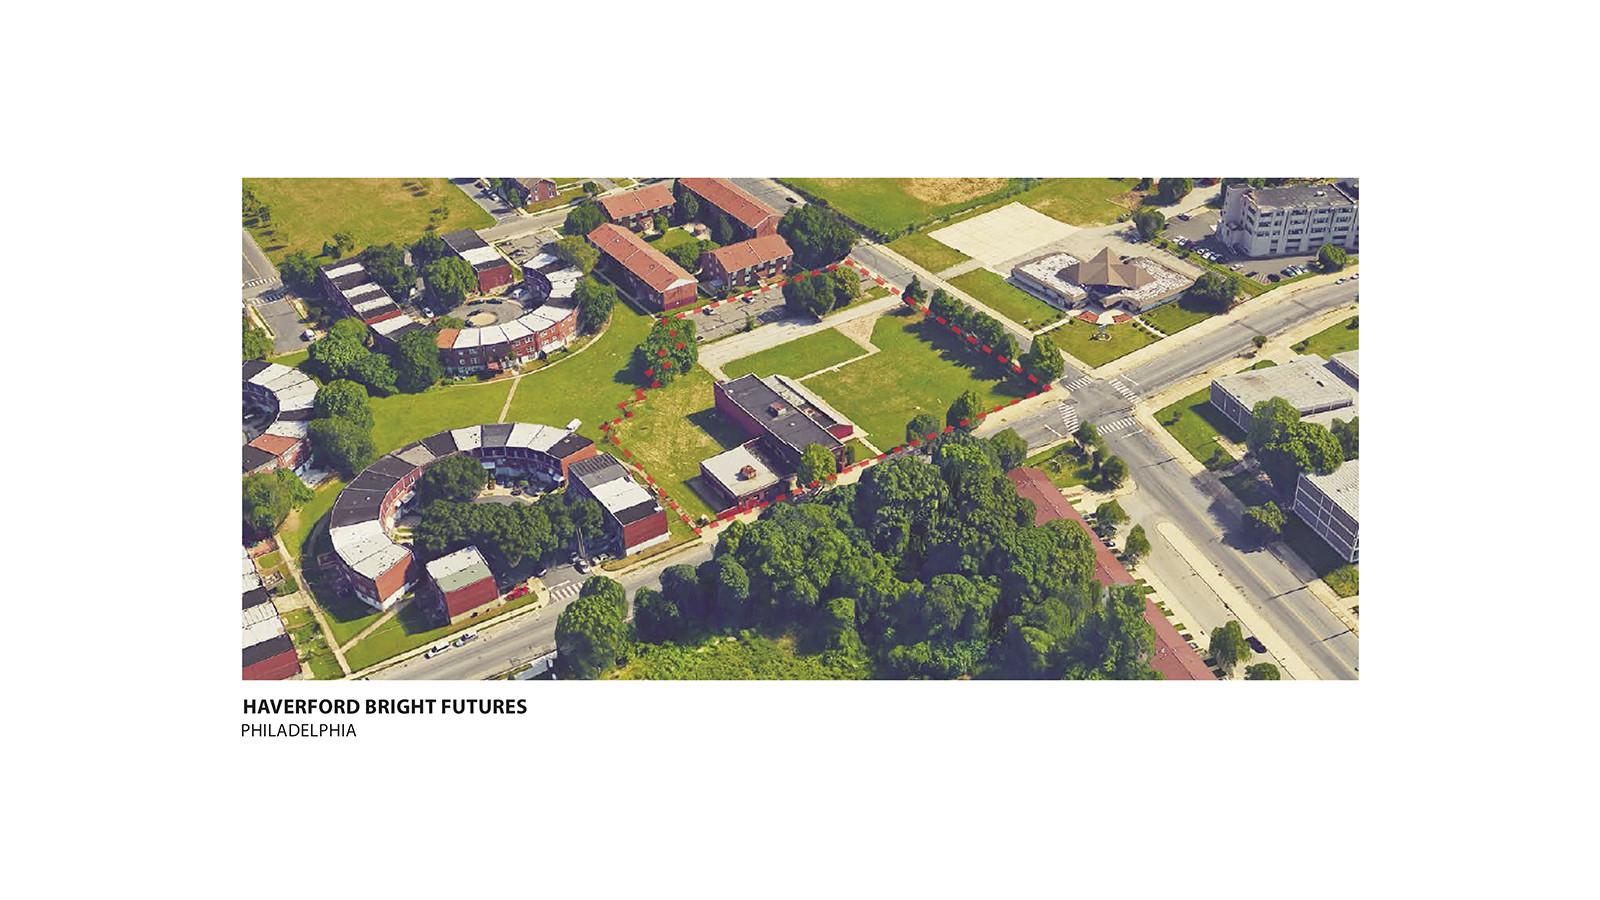 KAMJZ-Philadelphia-Haverford-Bright-Futures-1-1600×900-2